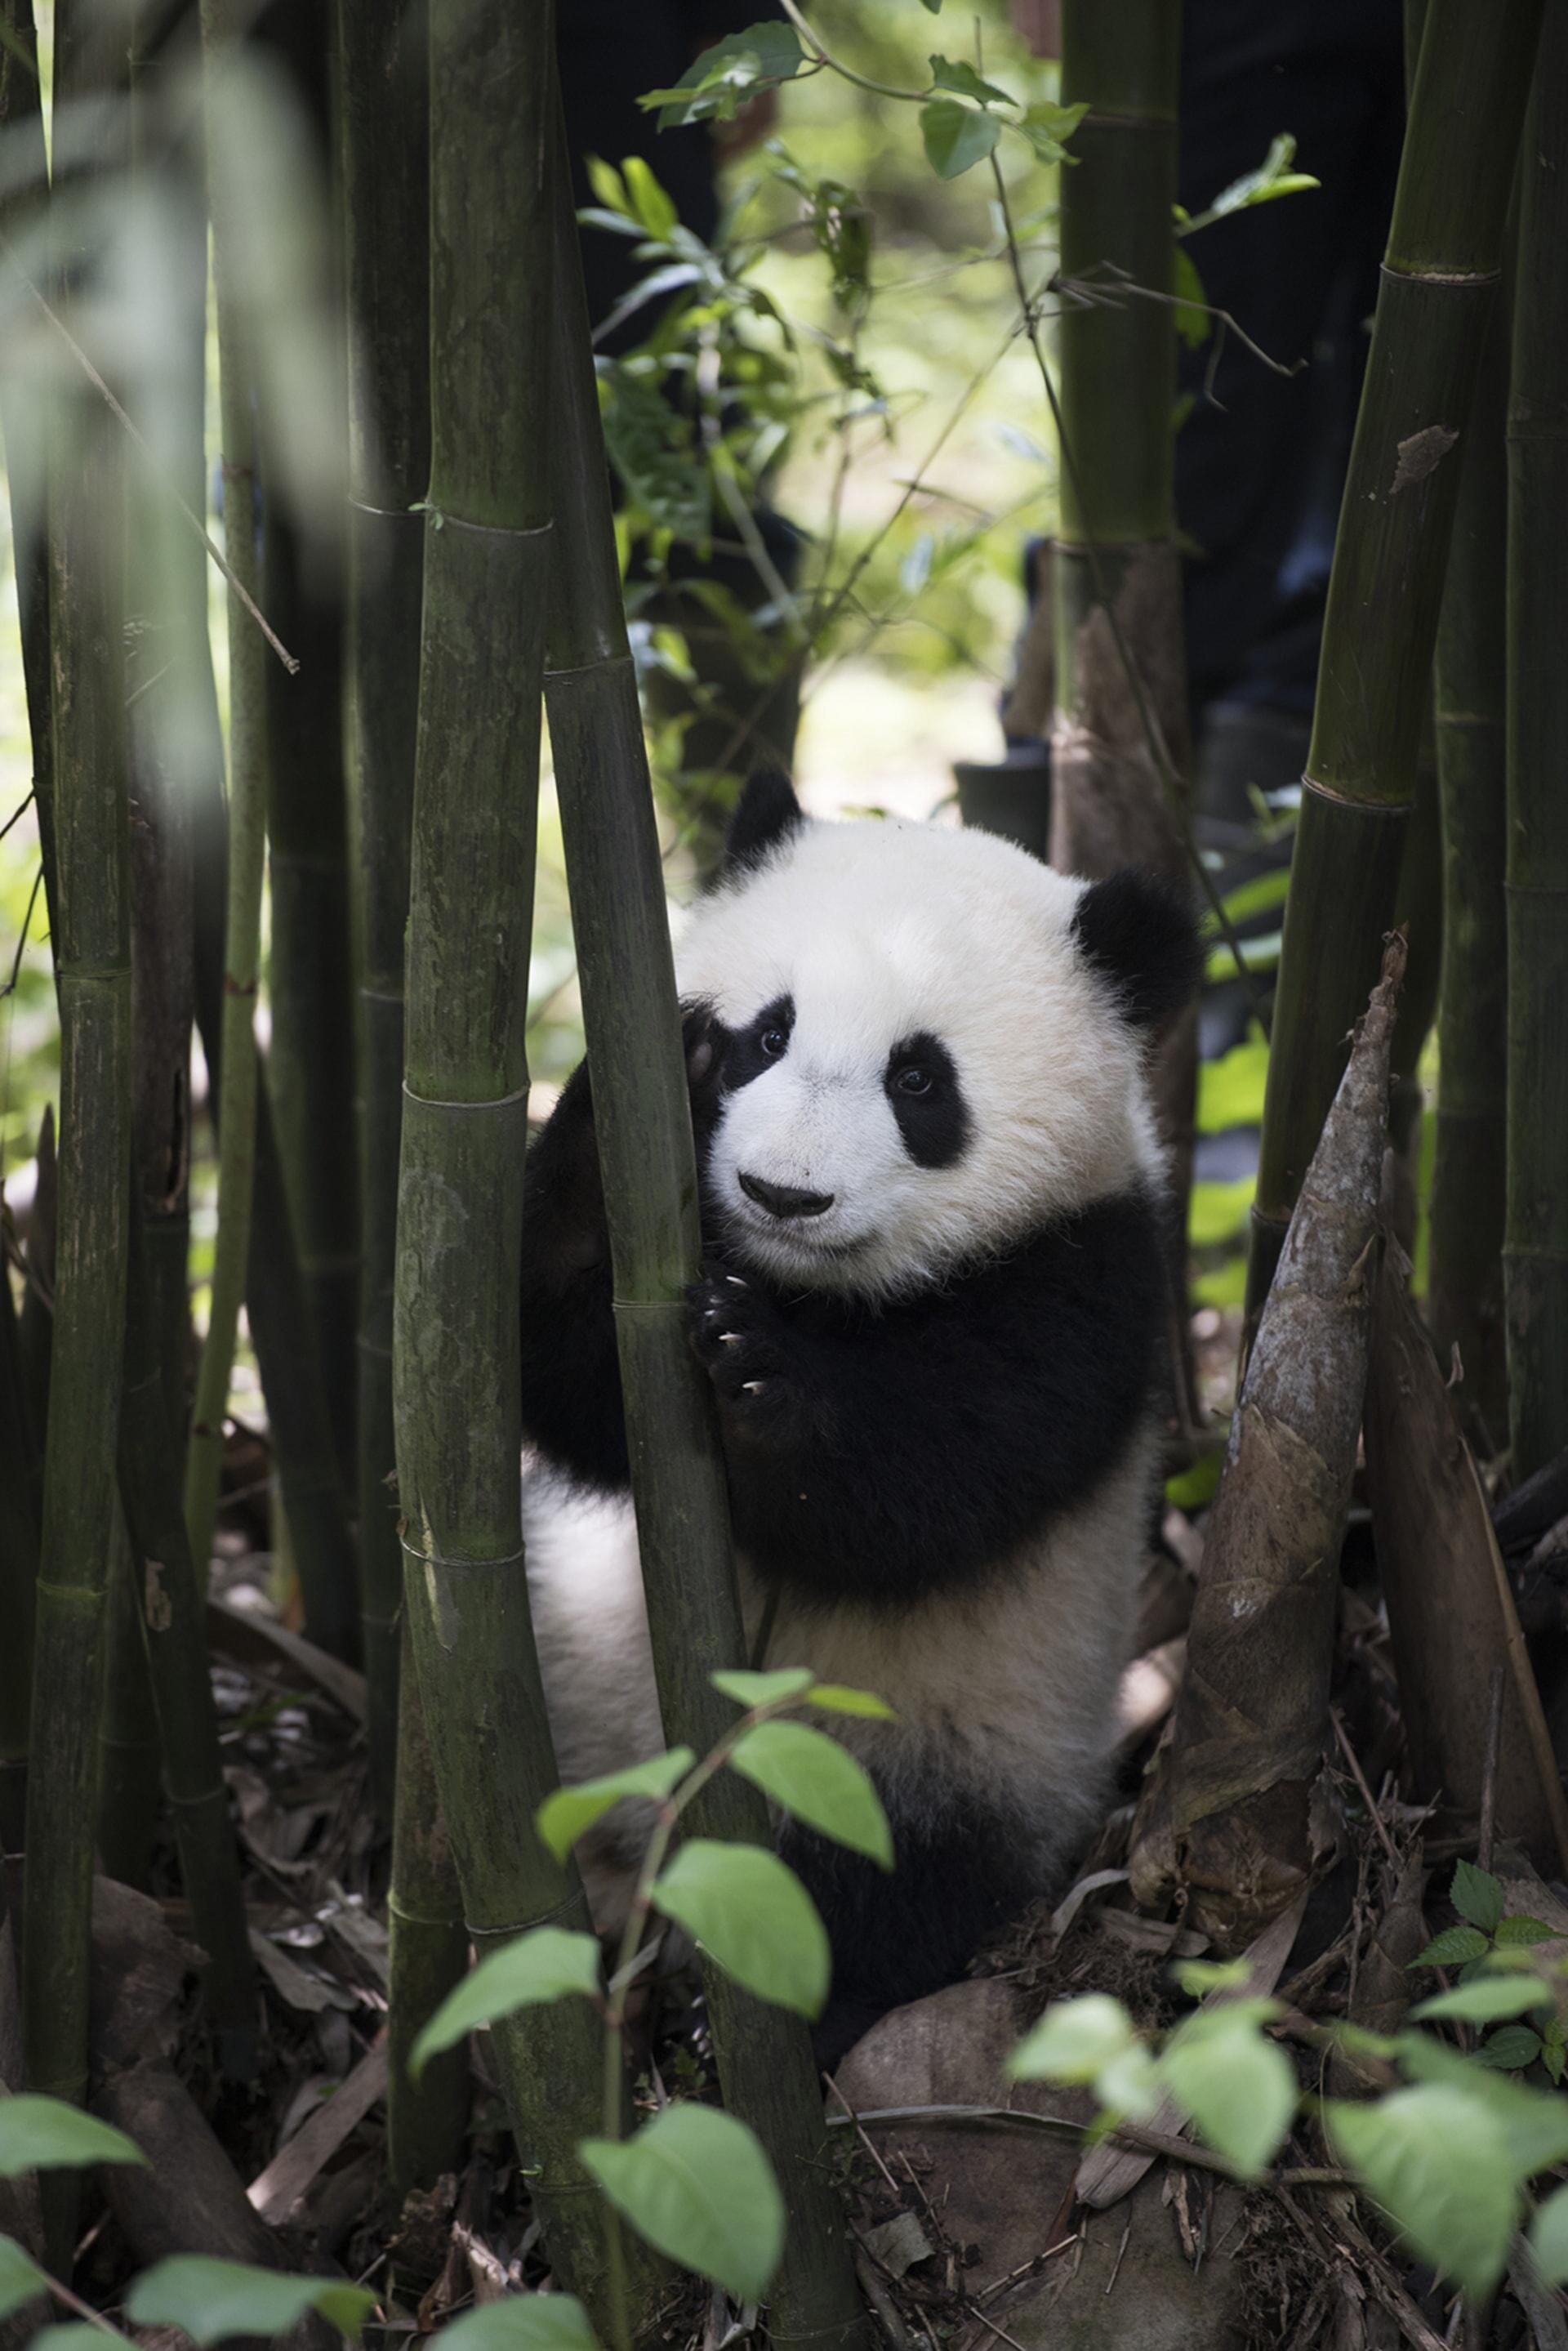 A Giant Panda at Panda Valley in Dujiangyan, China as seen in the new IMAX® film, PANDAS